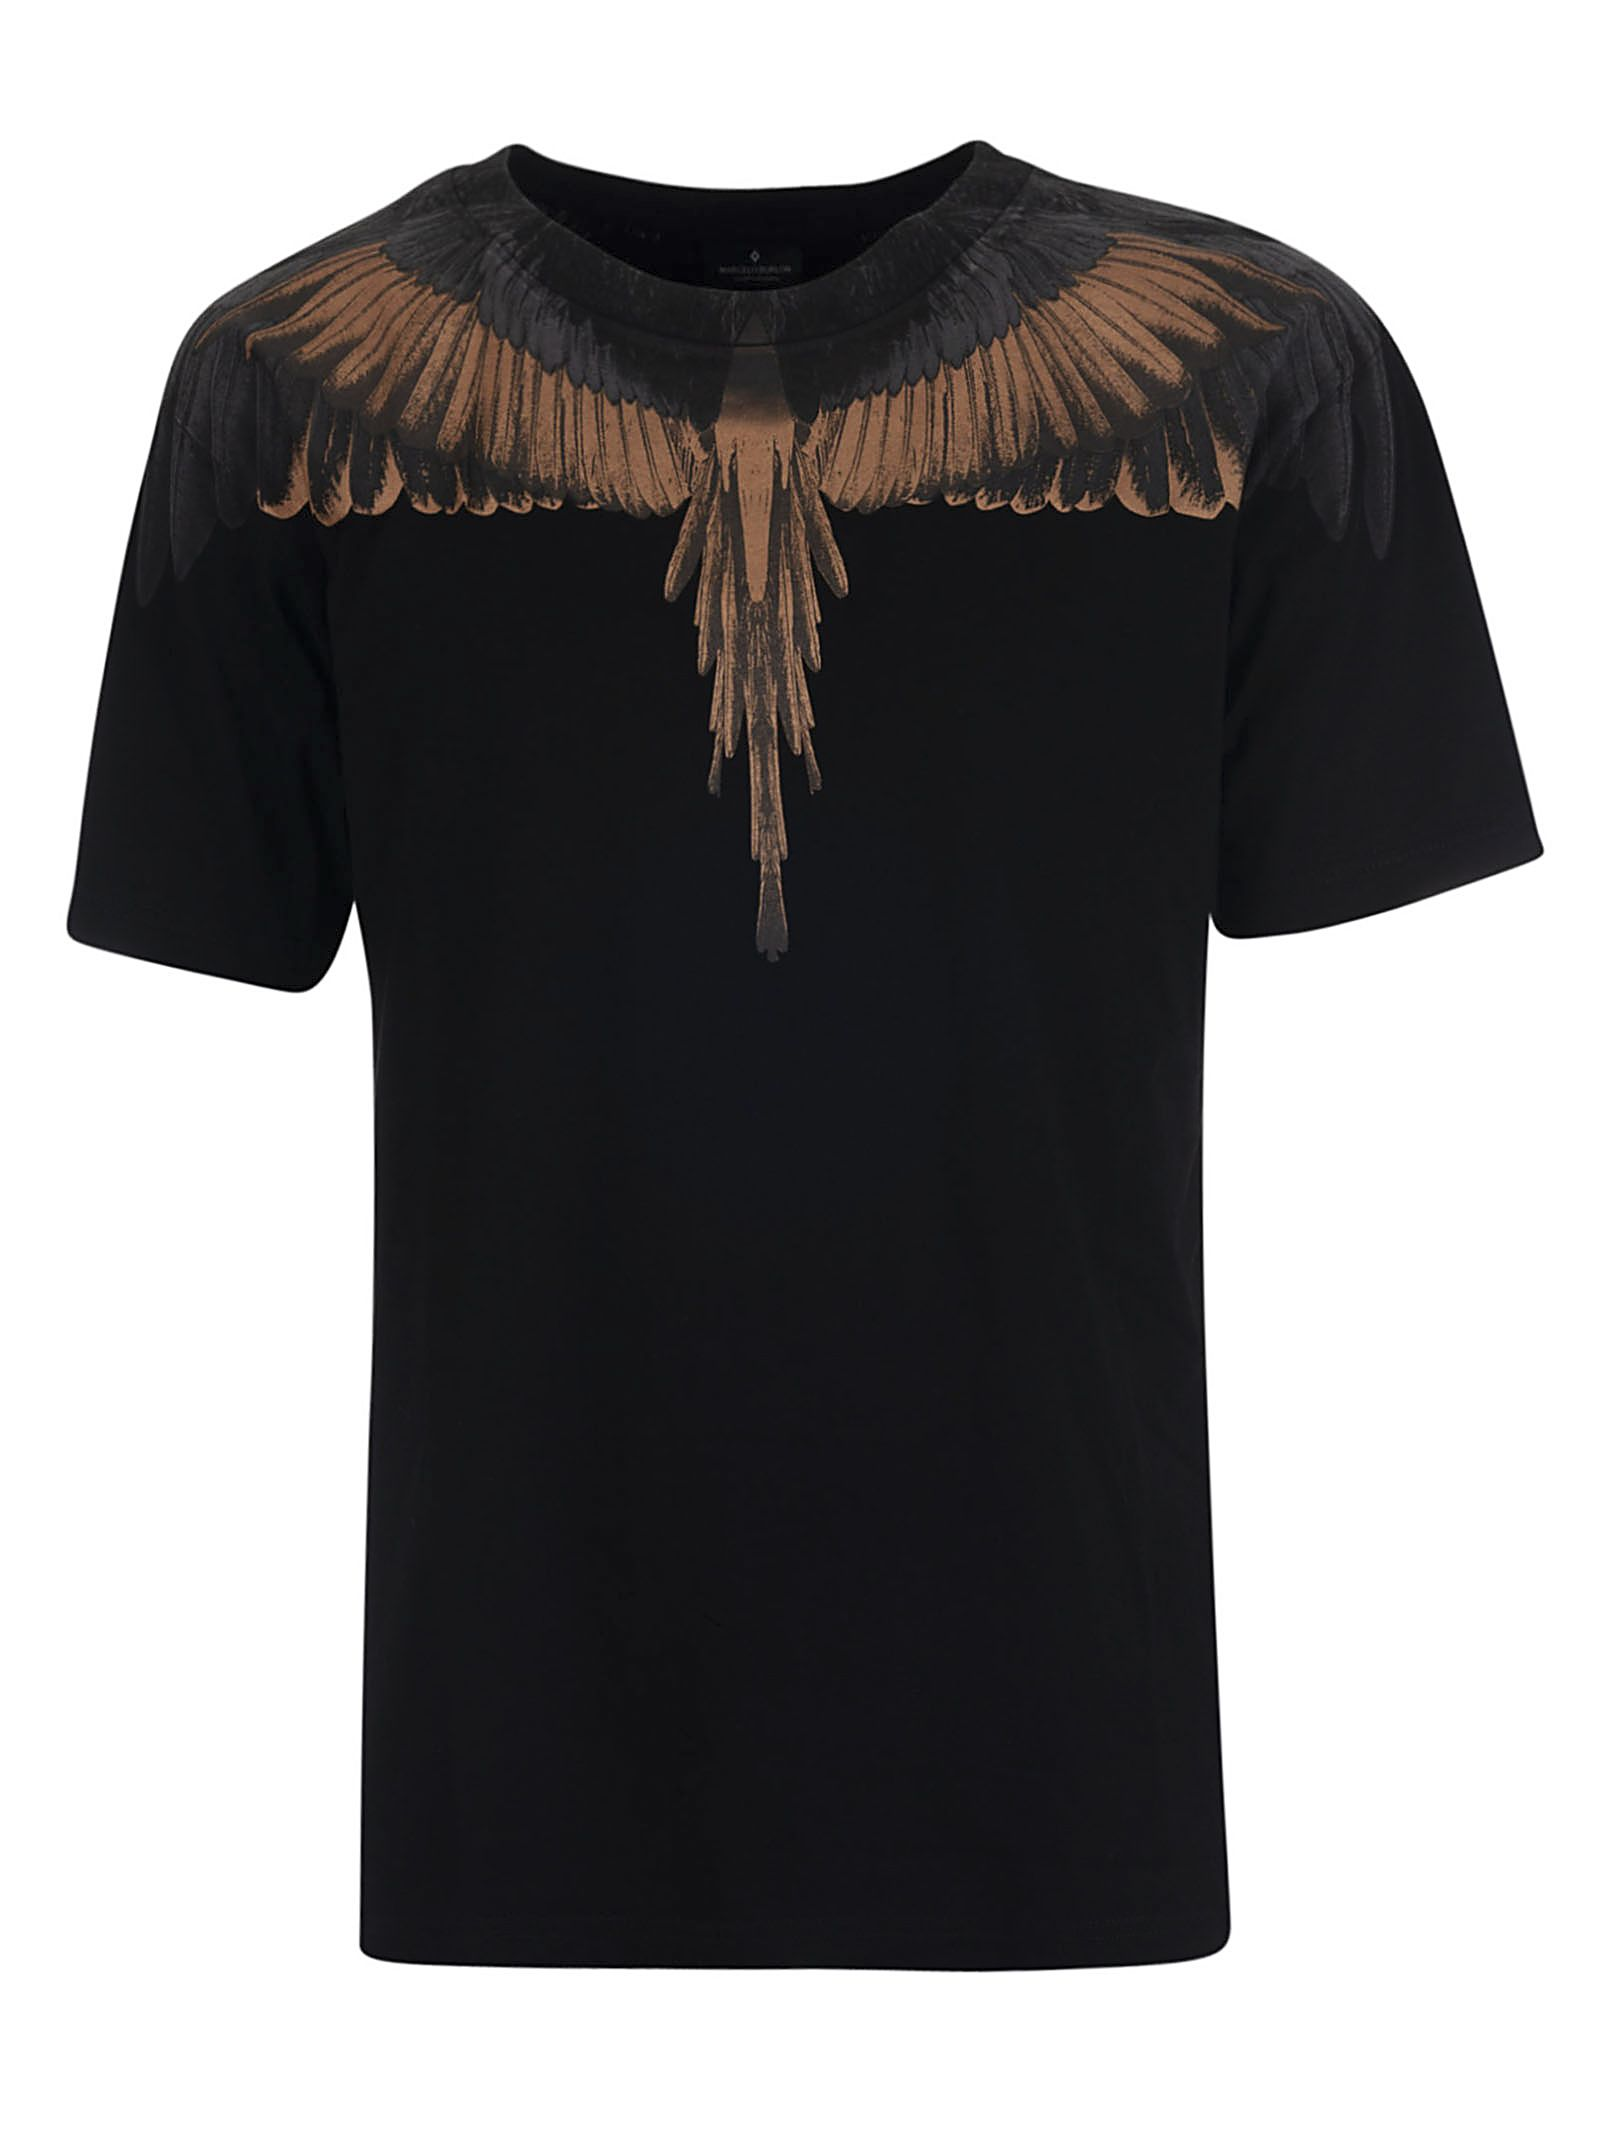 Marcelo Burlon Marcelo Burlon Wings Print T Shirt Black Gold